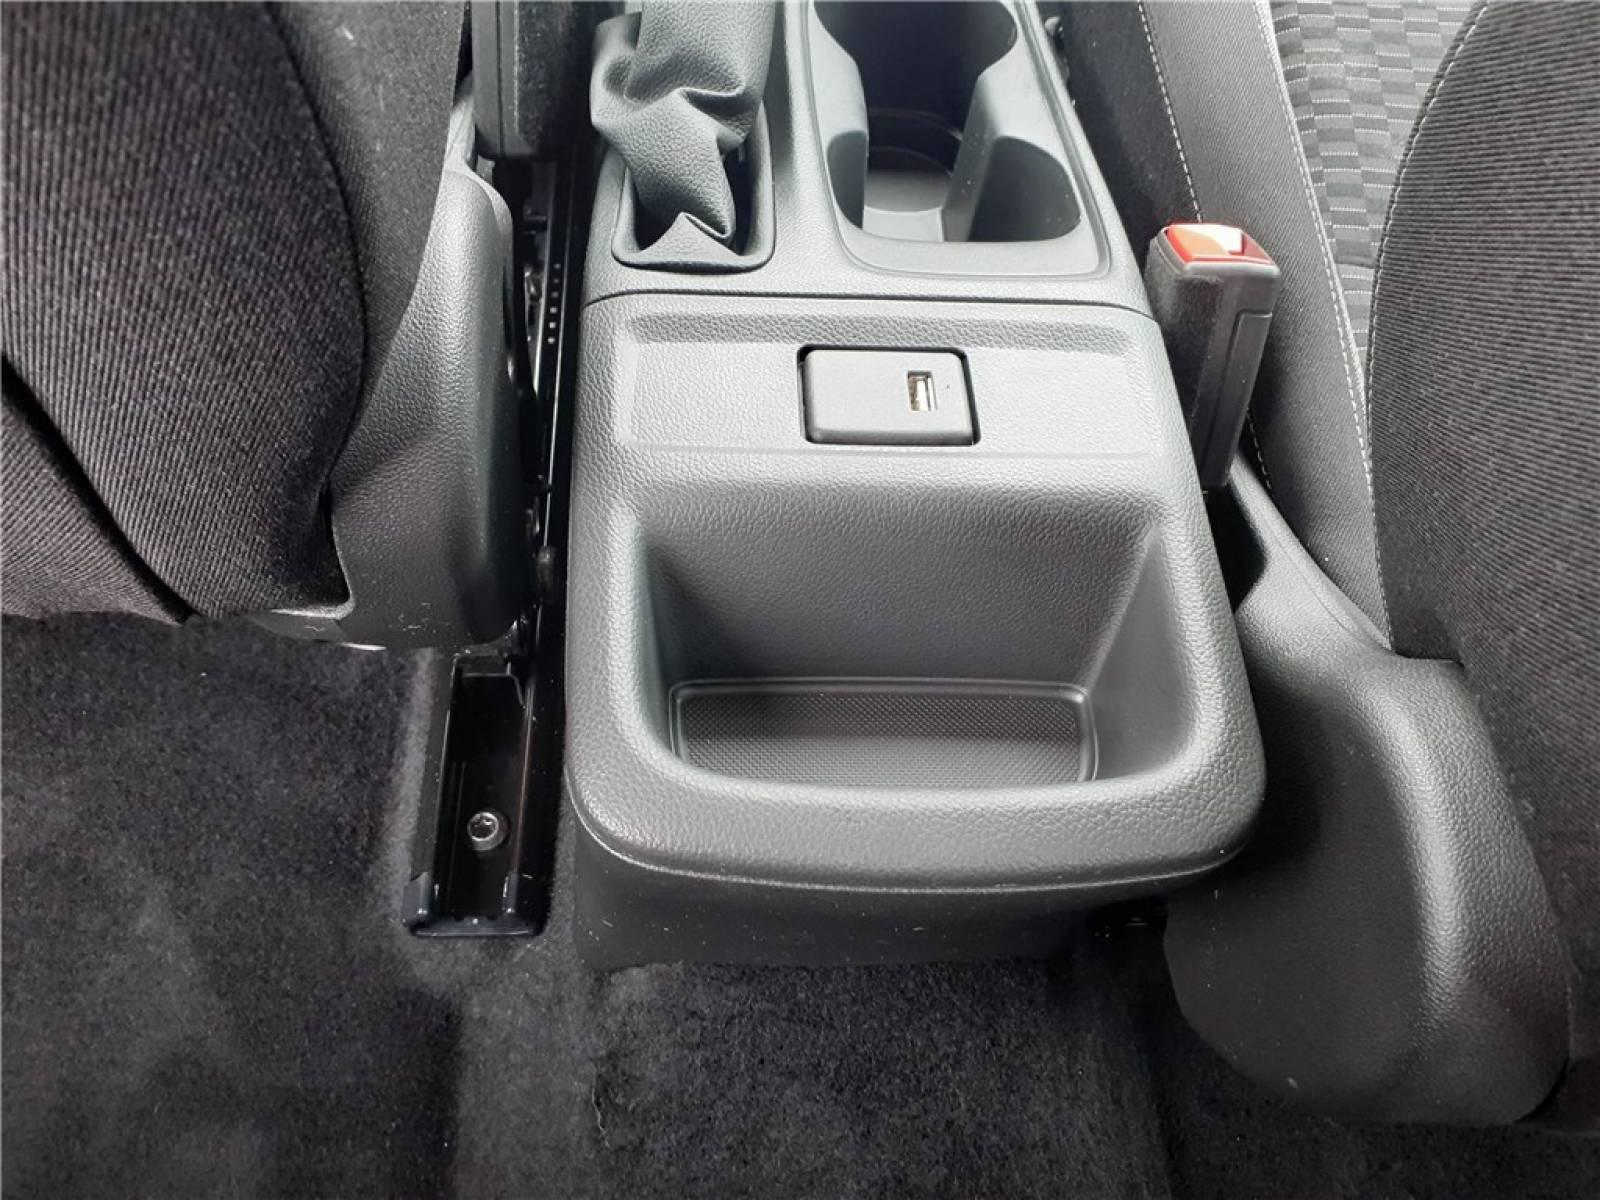 OPEL Astra Sports Tourer 1.5 Diesel 122 ch BVA9 - véhicule d'occasion - Groupe Guillet - Opel Magicauto - Chalon-sur-Saône - 71380 - Saint-Marcel - 34